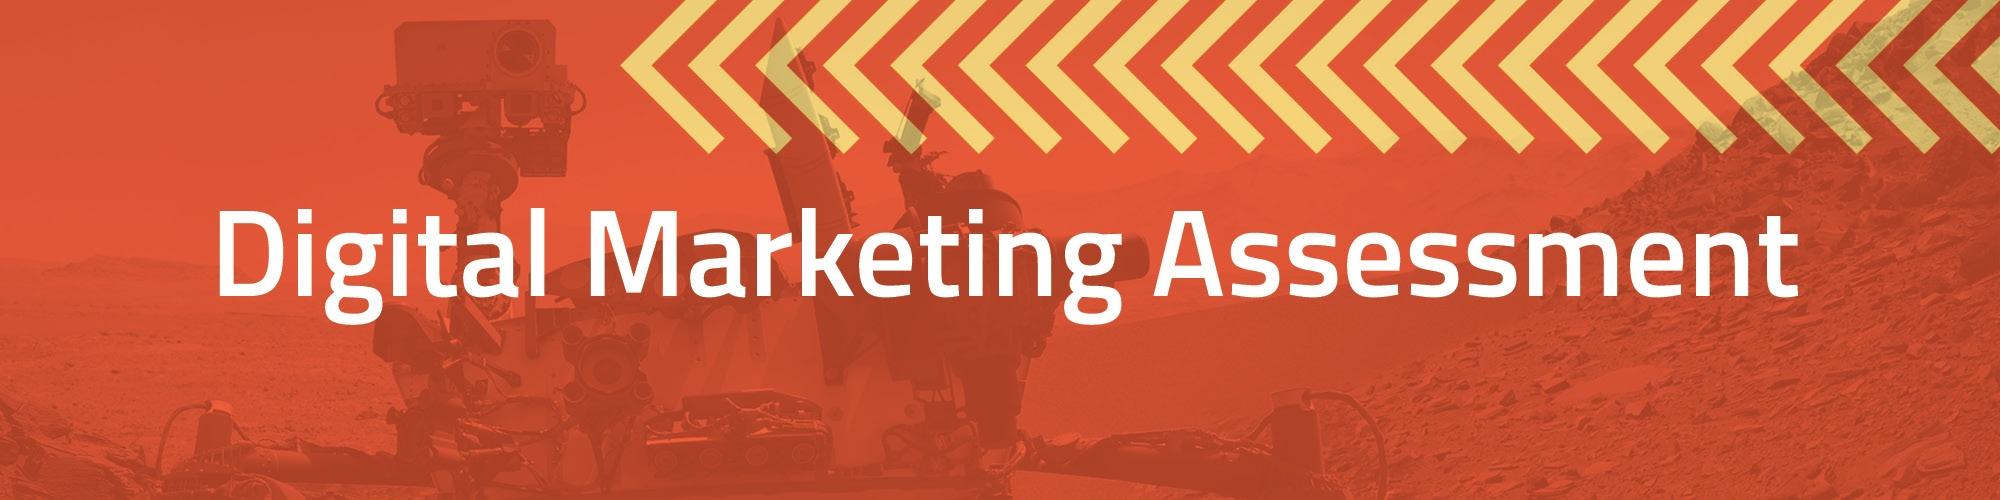 Imagewerks Marketing Digital Marketing Assessment